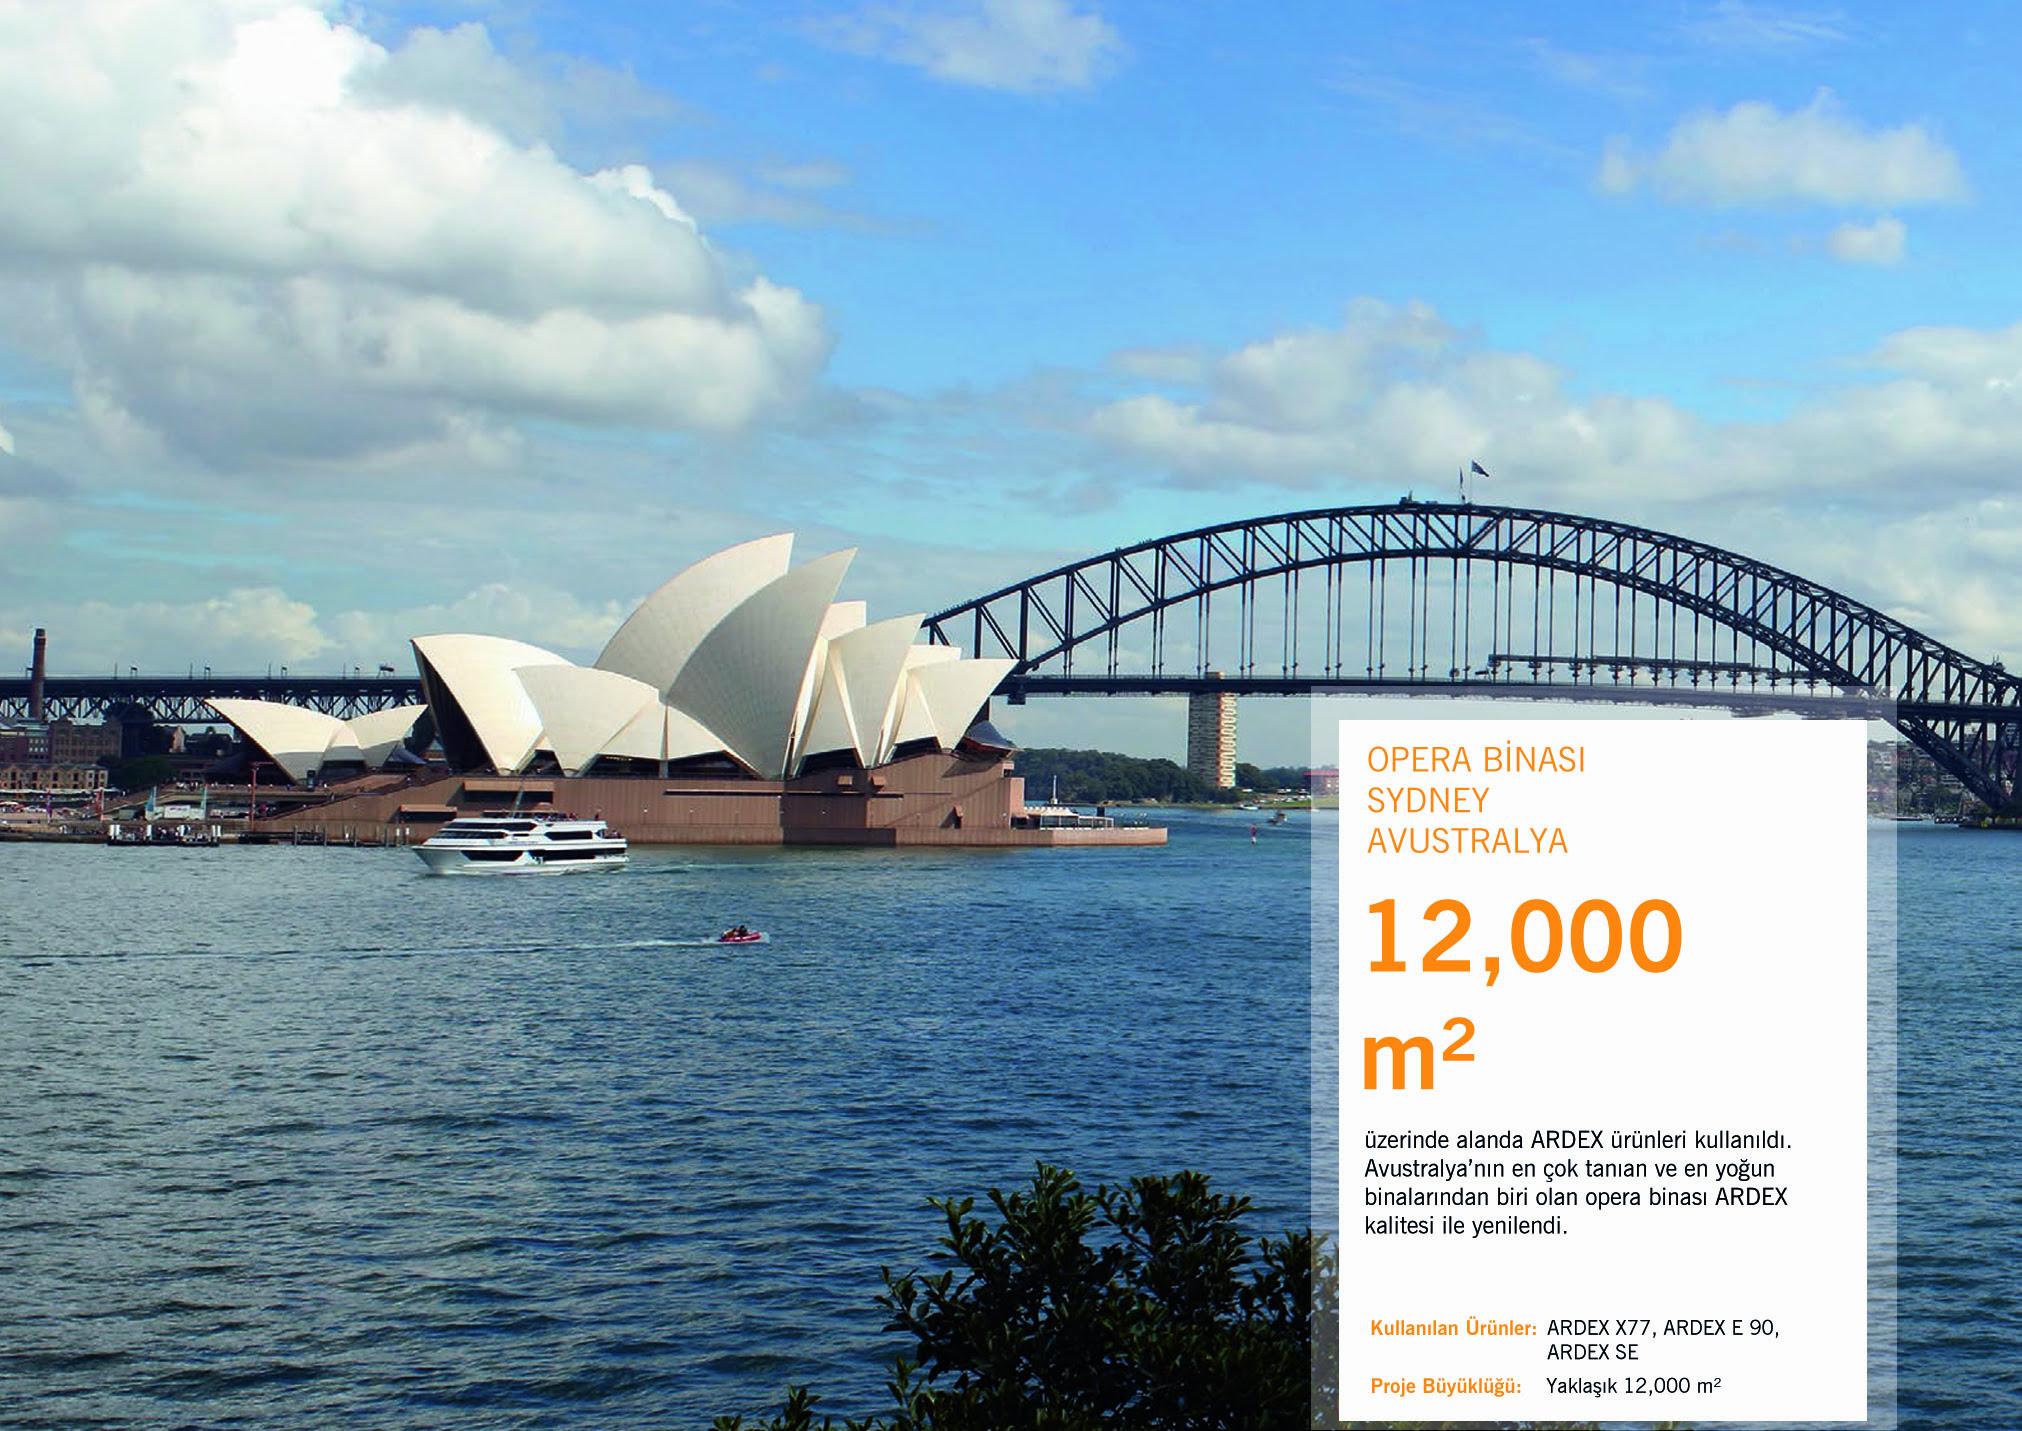 Sydney Opera Binası 2